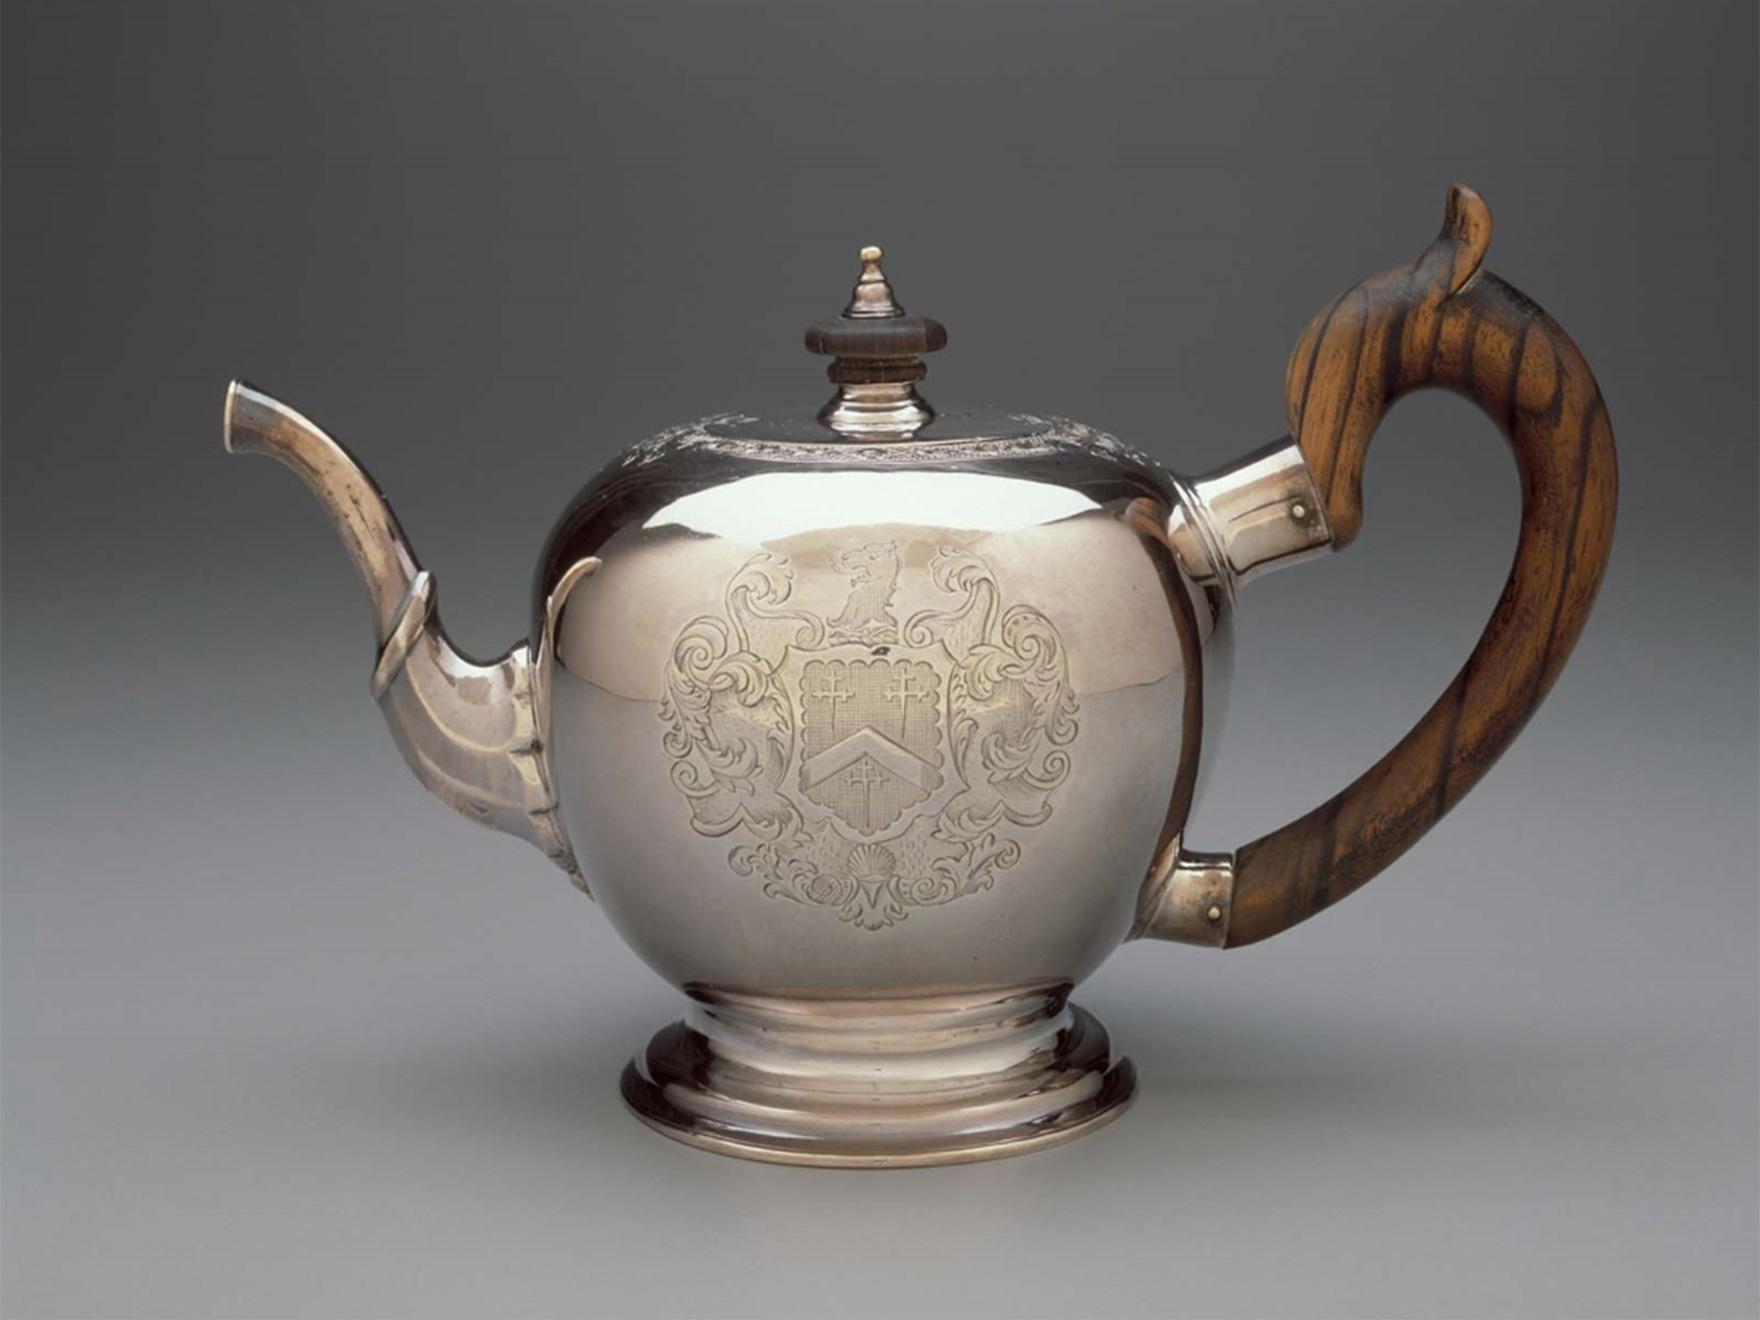 Jacob Hurd, Teapot, about 1730–35